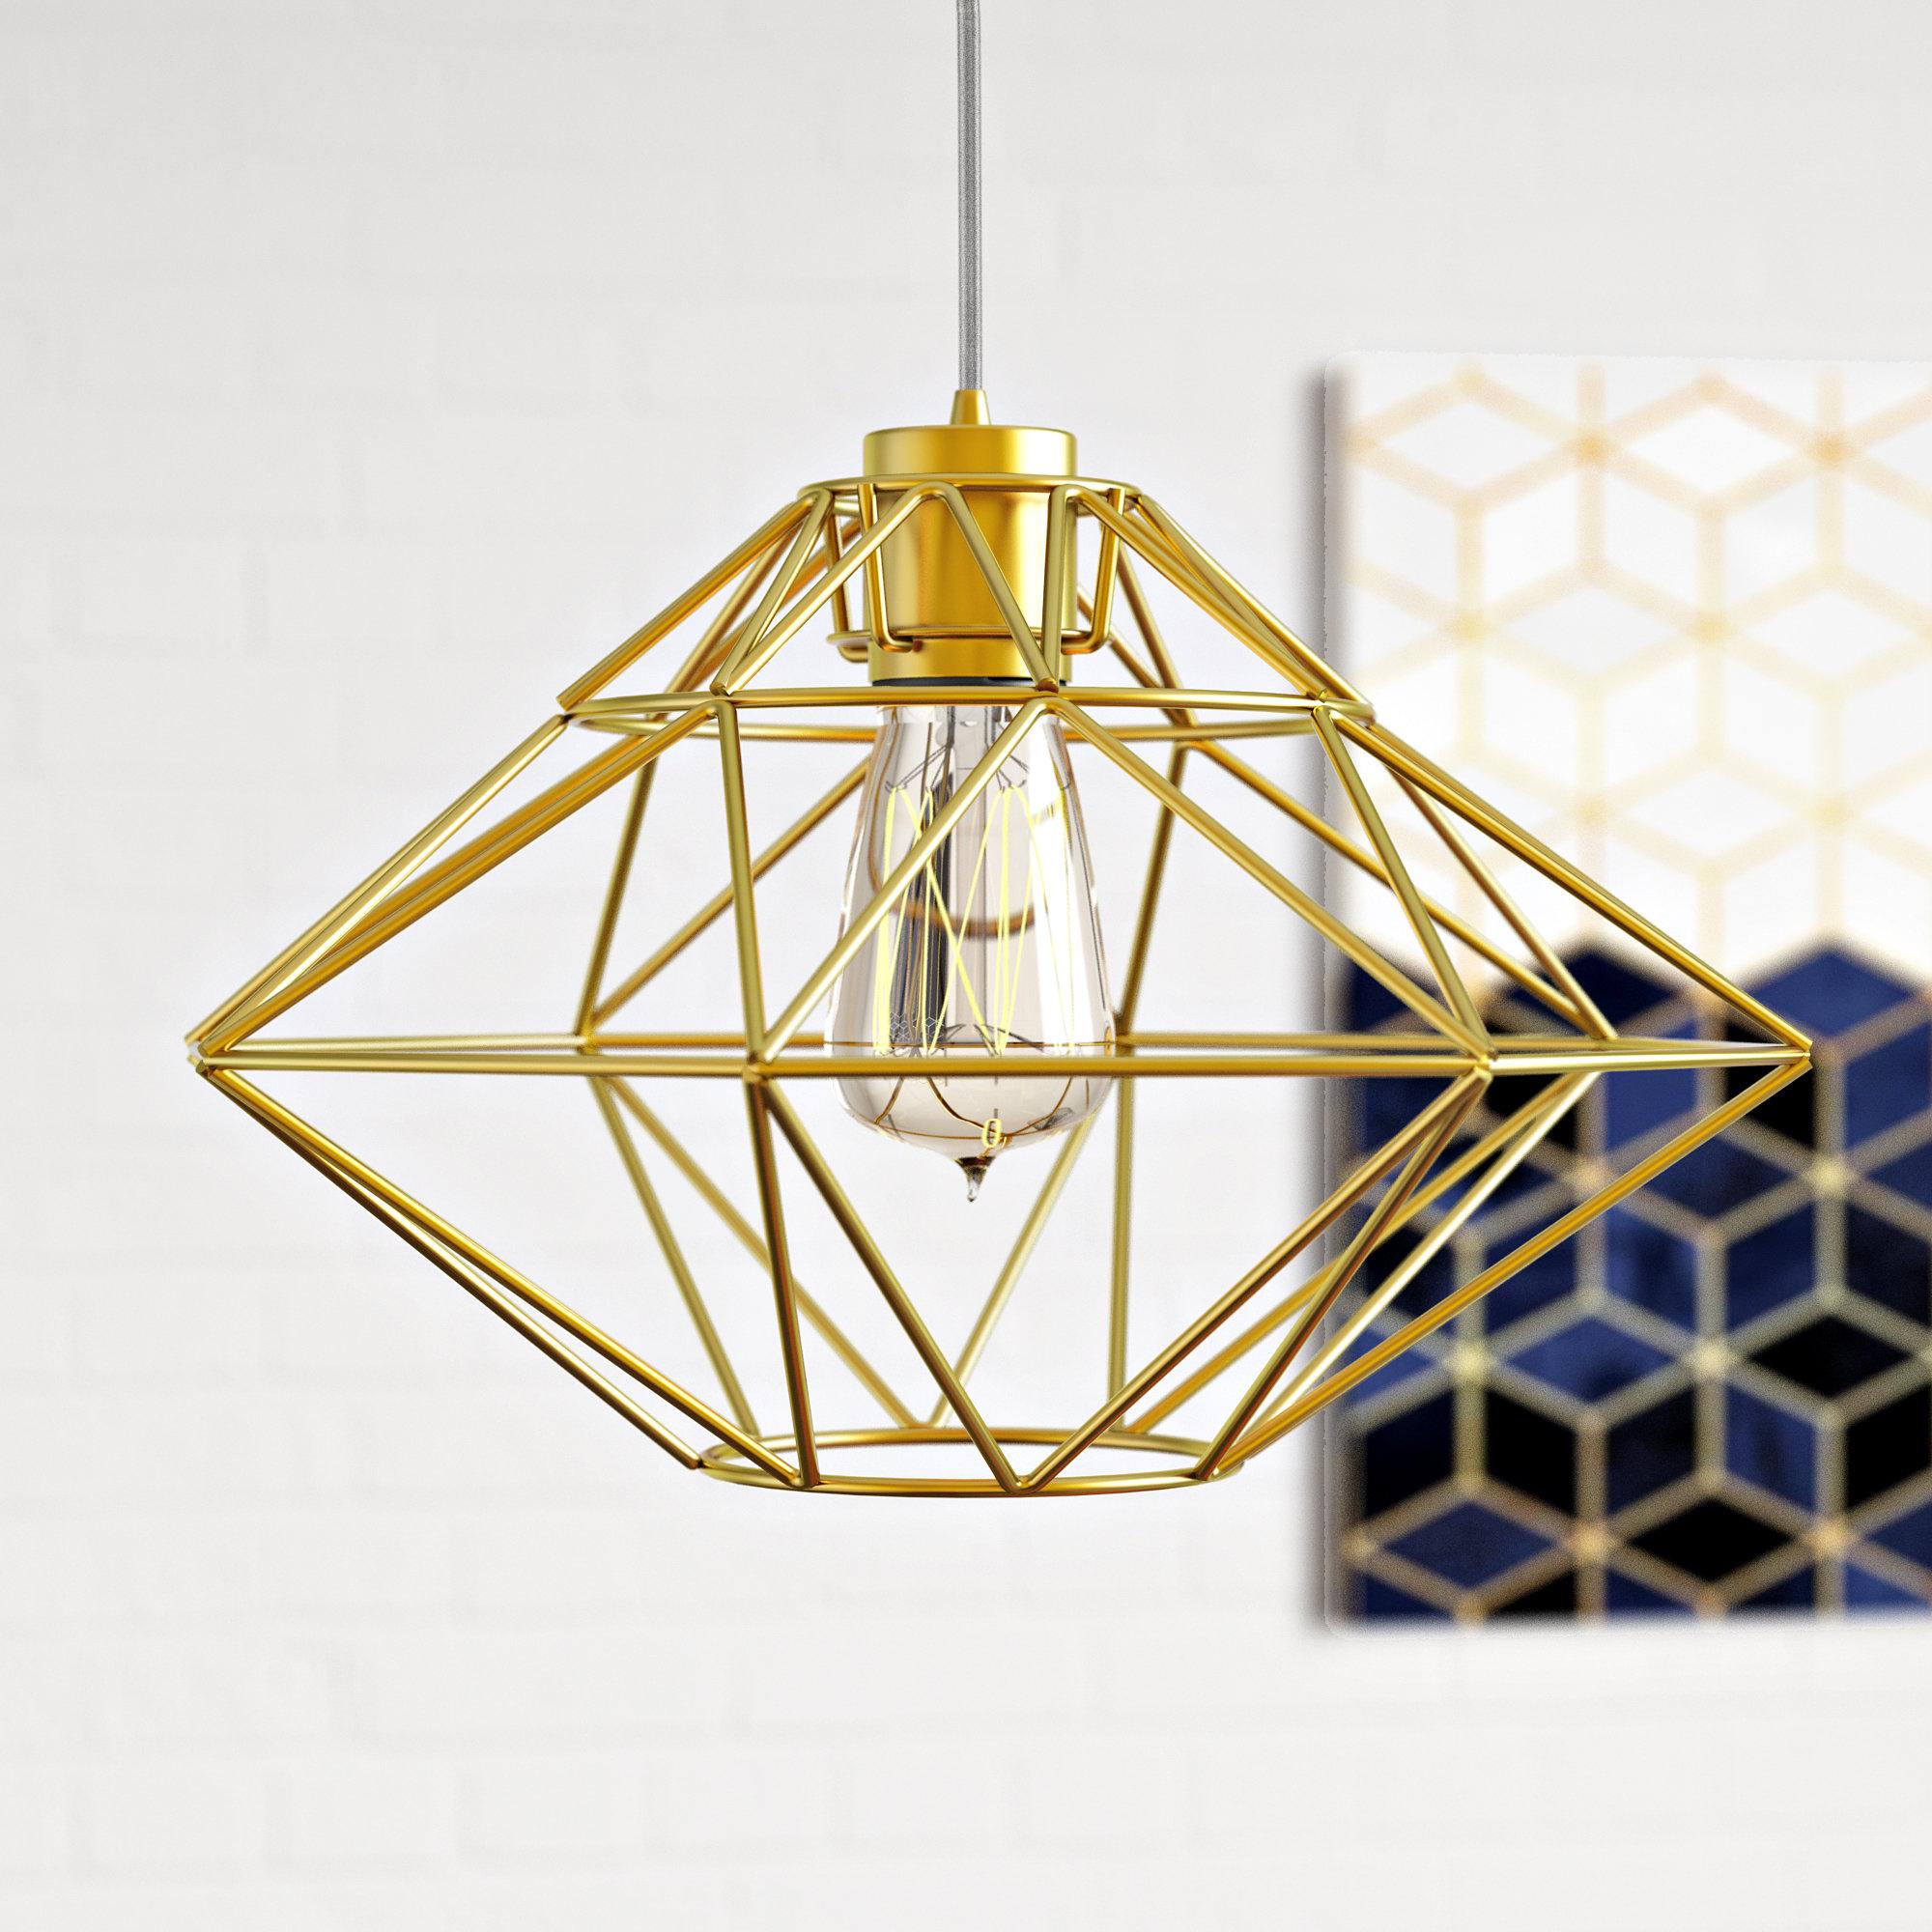 Alcorn Lake 1 Light Geometric Pendant For 2020 Hydetown 1 Light Single Geometric Pendants (Gallery 5 of 20)